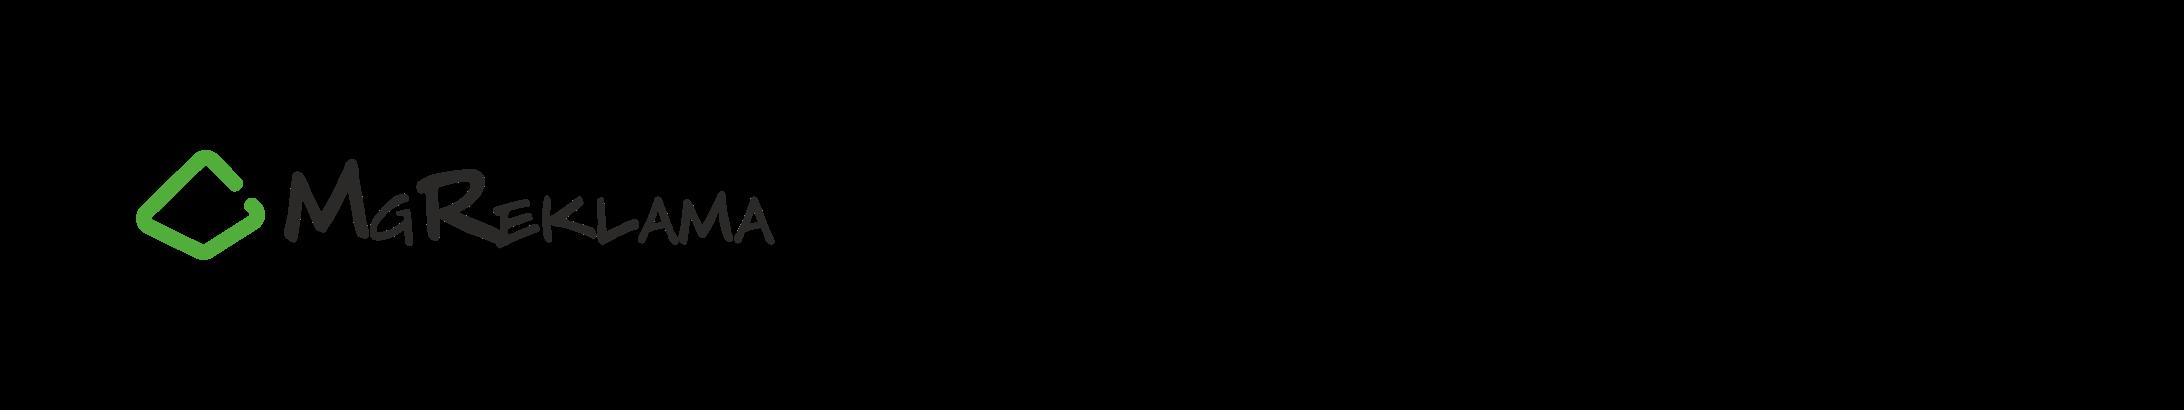 MG Reklama